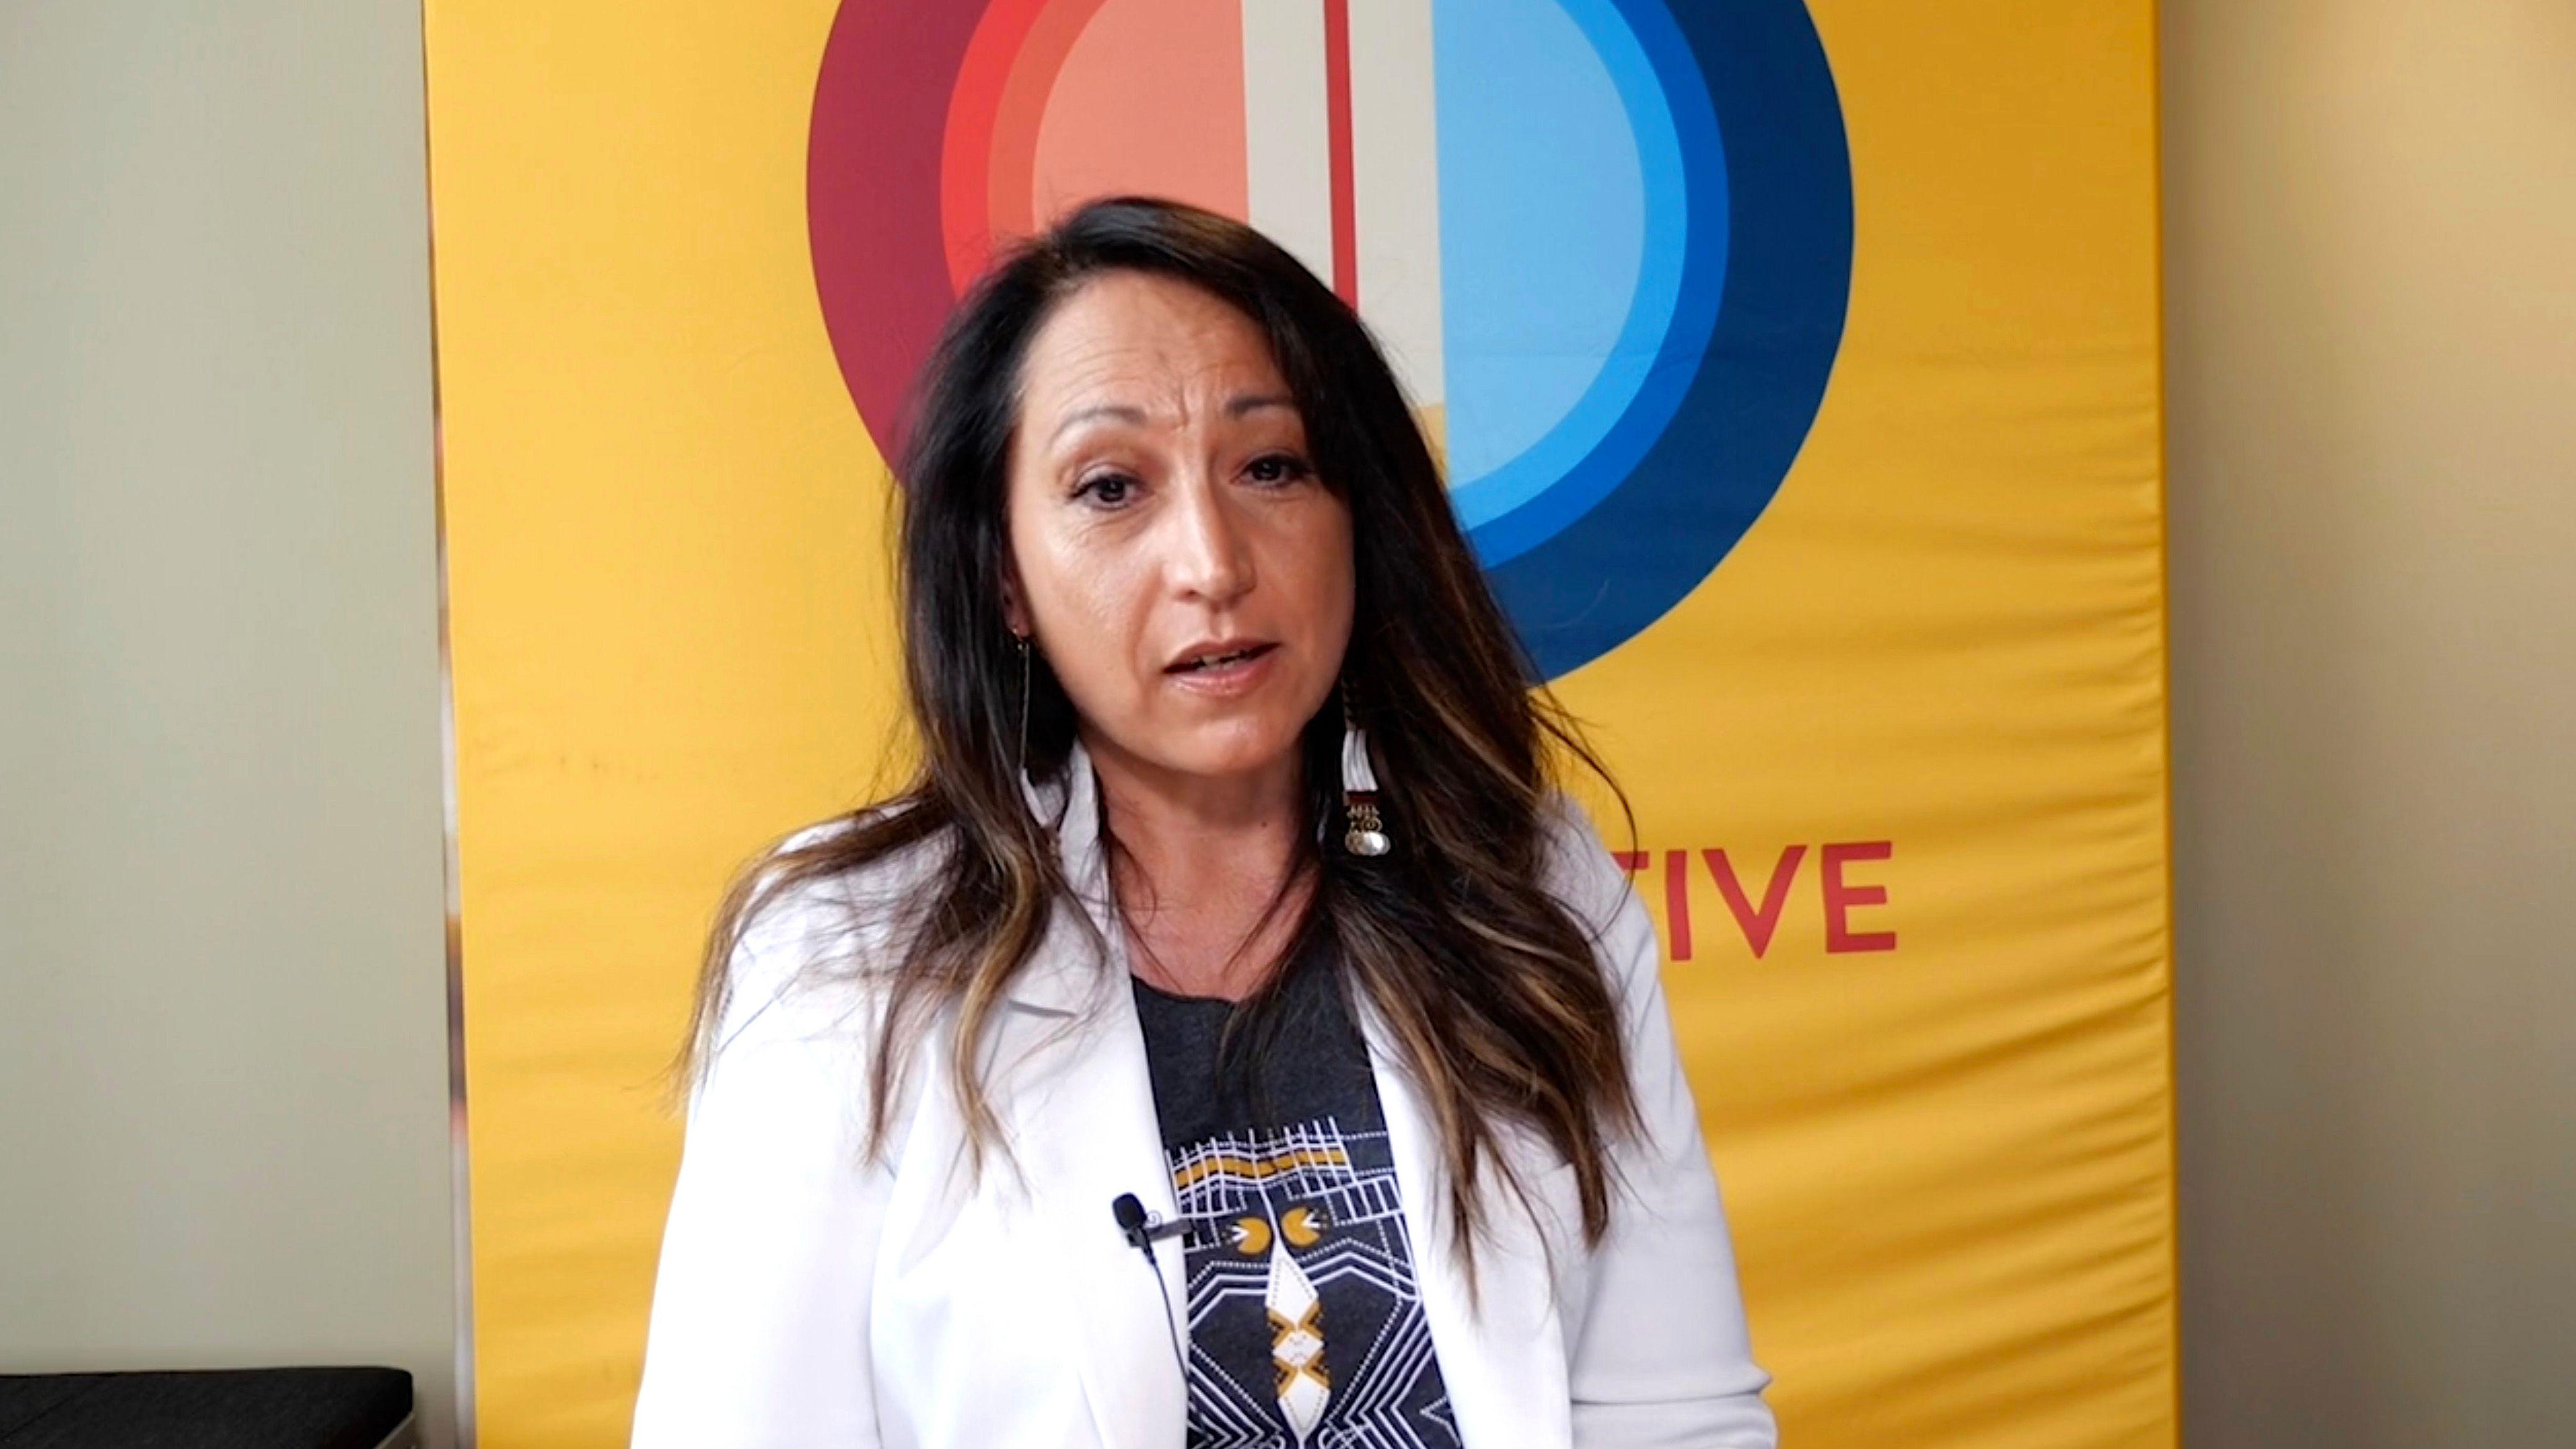 Crystal Echo Hawk, a Native American activist based in Oklahoma, said Republican senators showed their preoccupation with hel